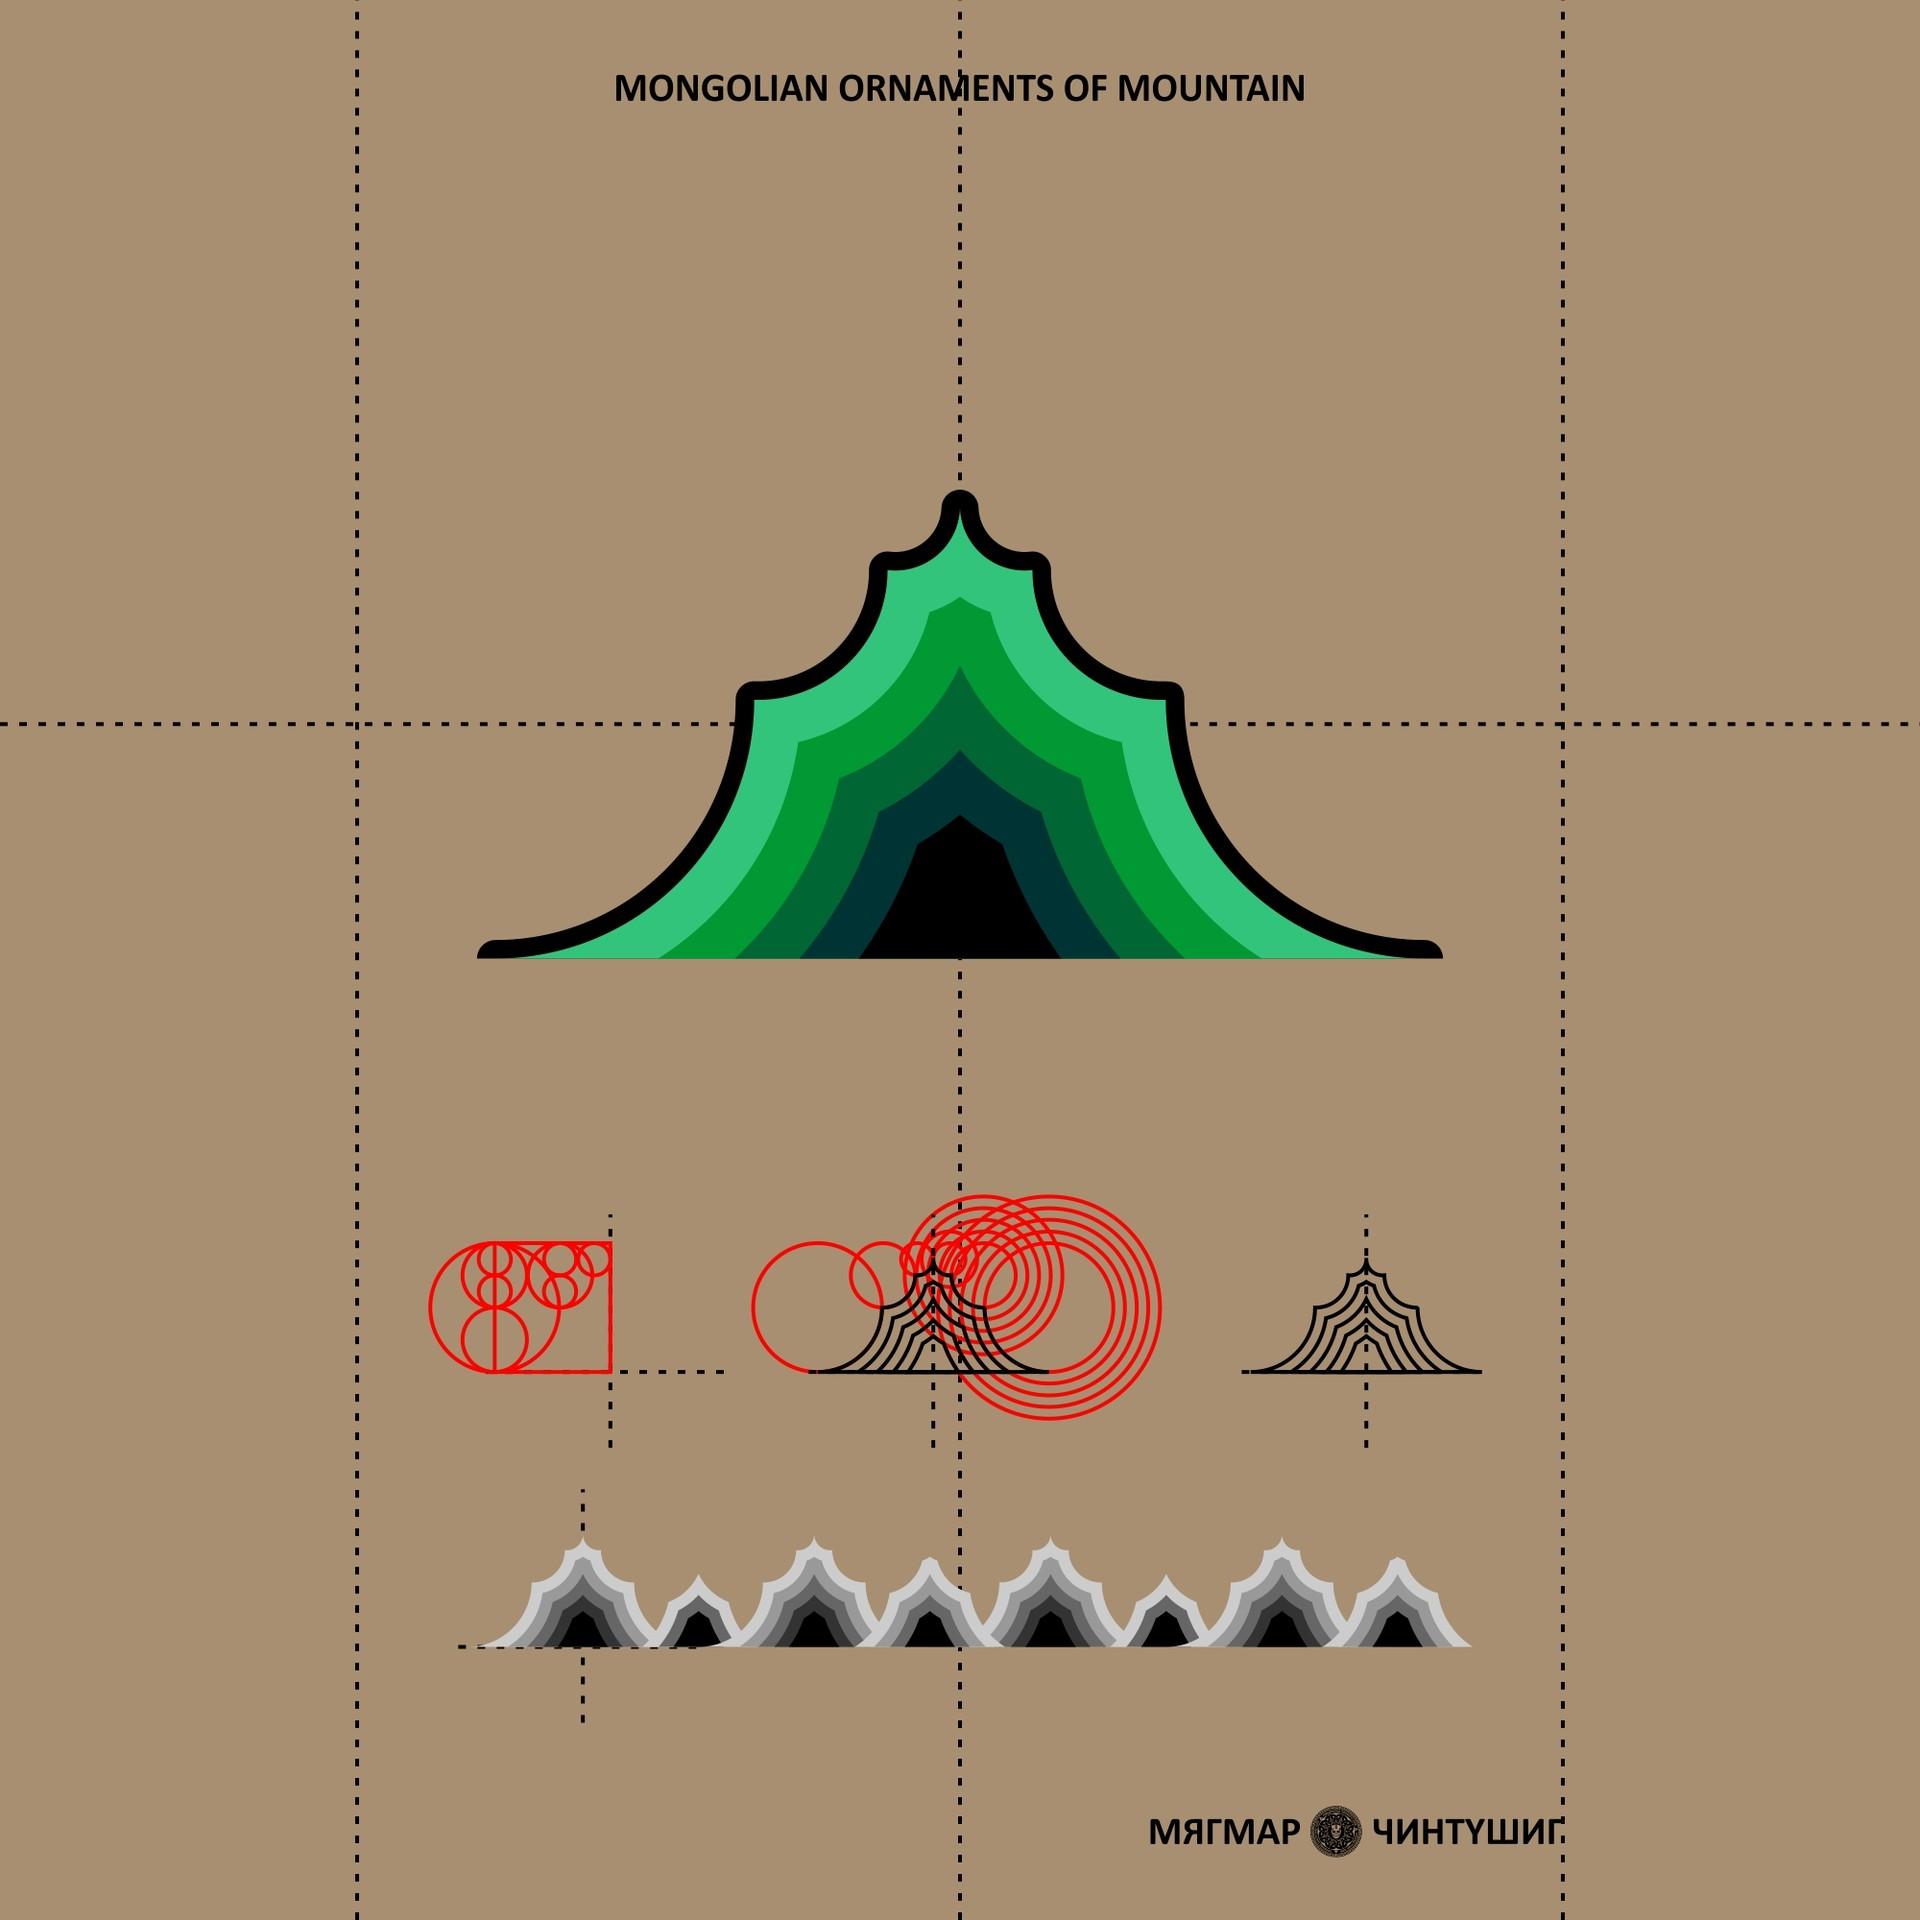 Mongolian ornament mountain